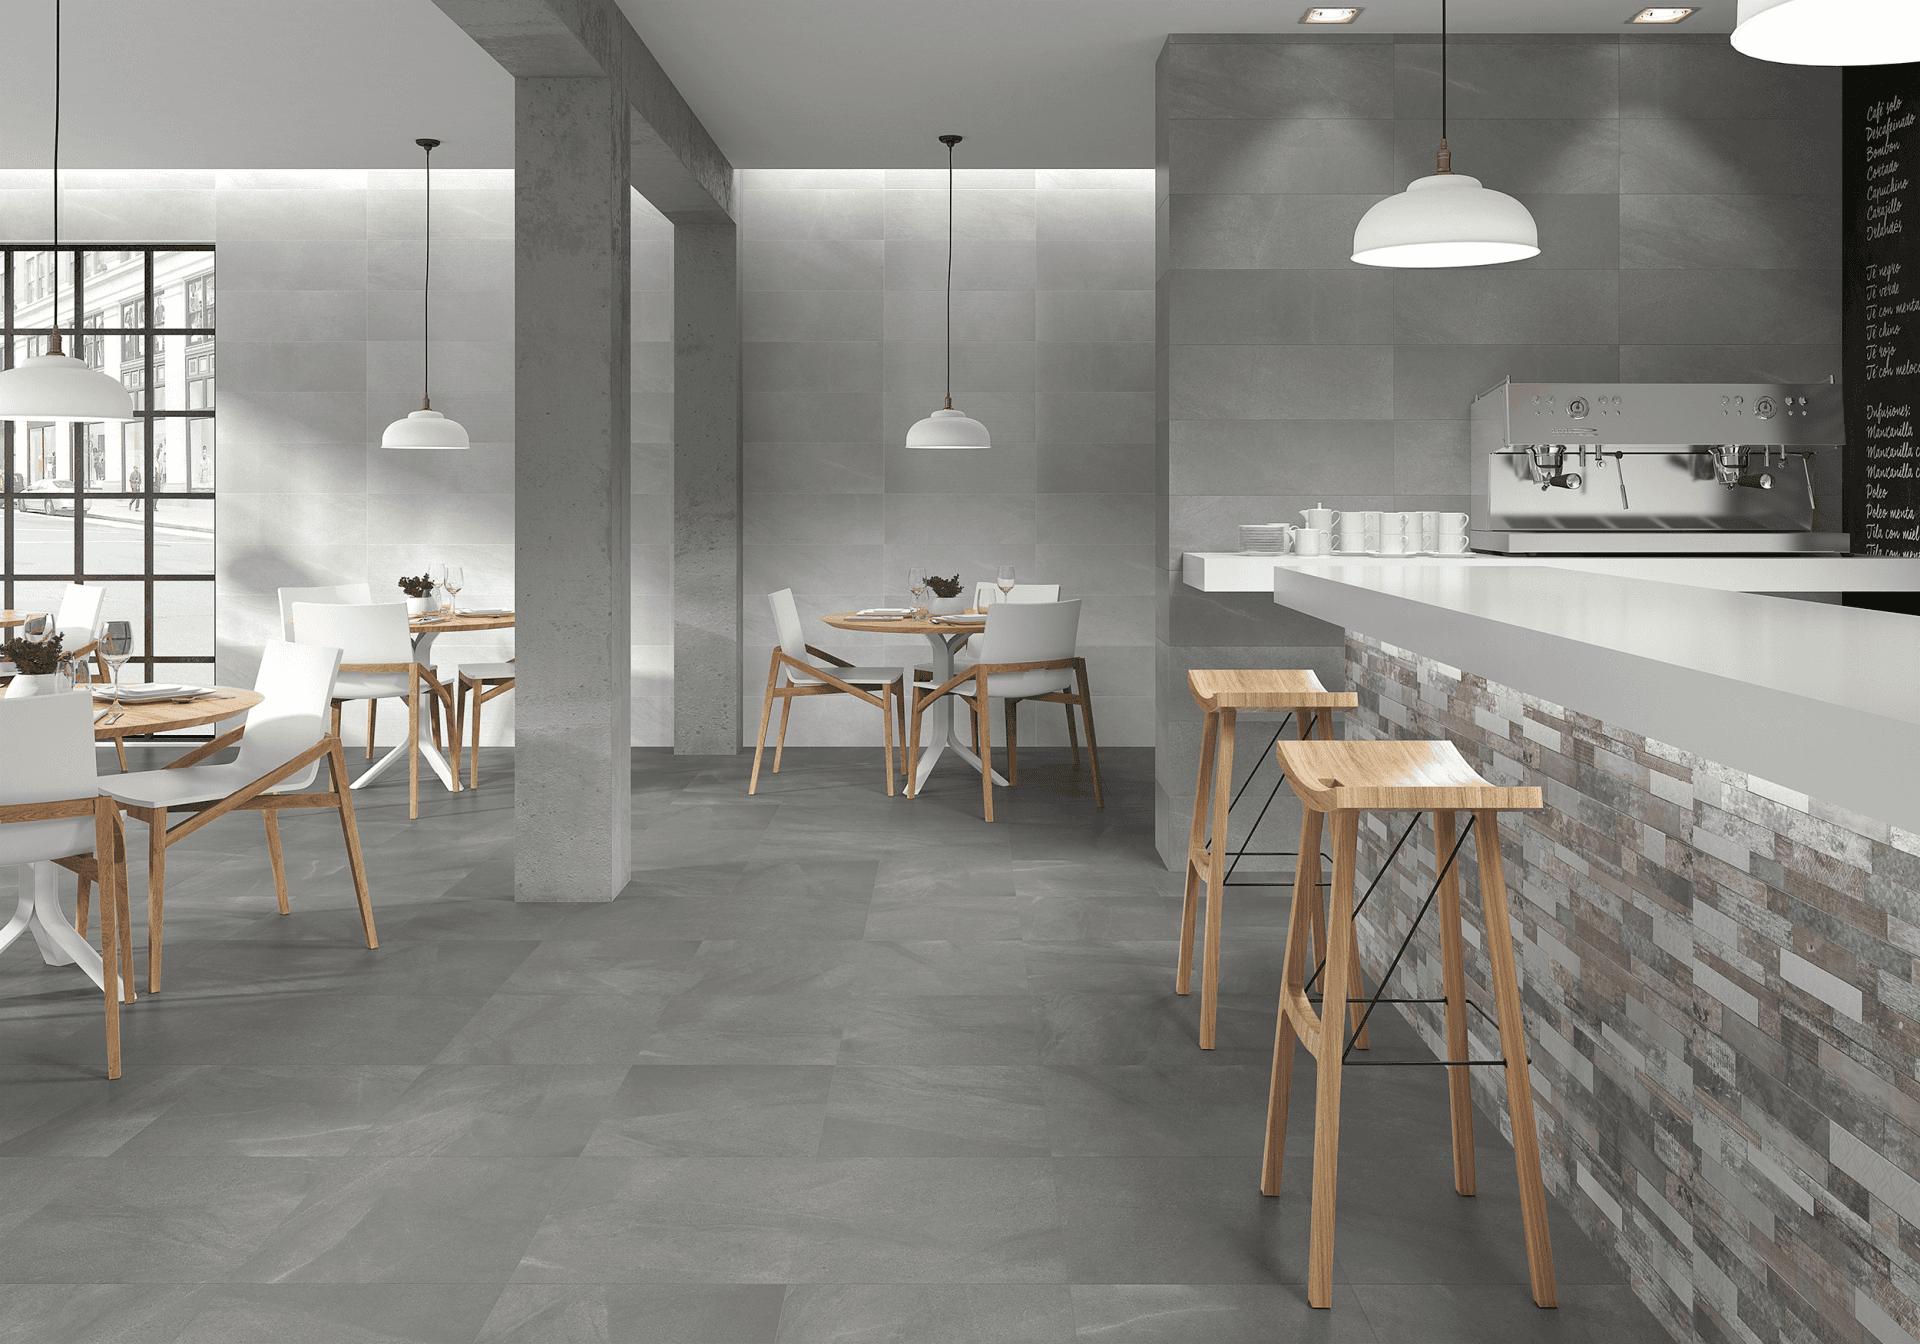 Indoor outdoor tile cairns marlin ceramic tiles slide title marlin tiles dailygadgetfo Images